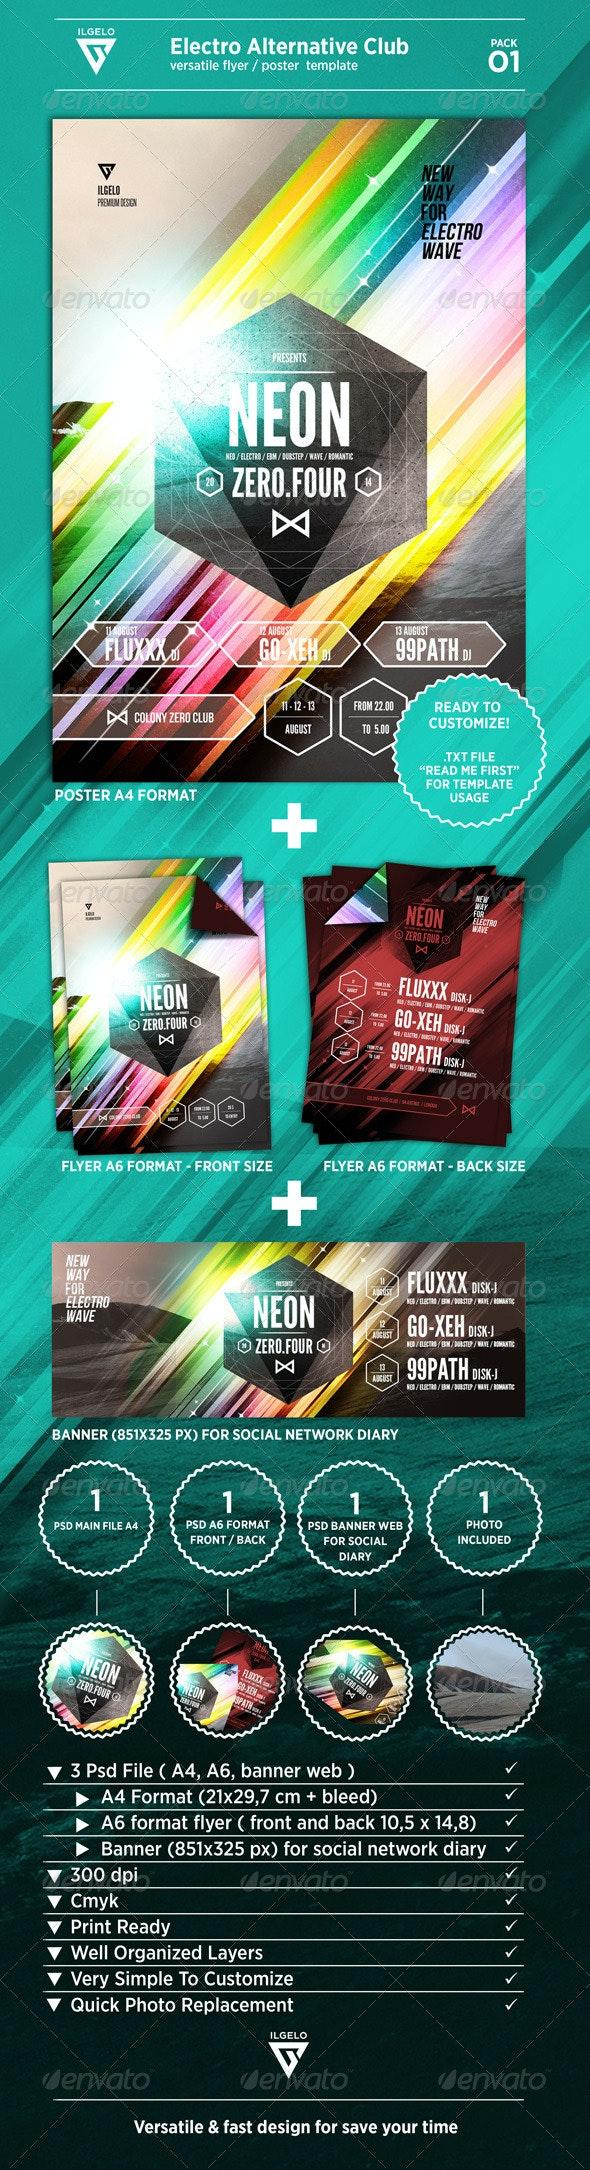 Electro Alternative Club / Poster Pack .01 - Print Templates